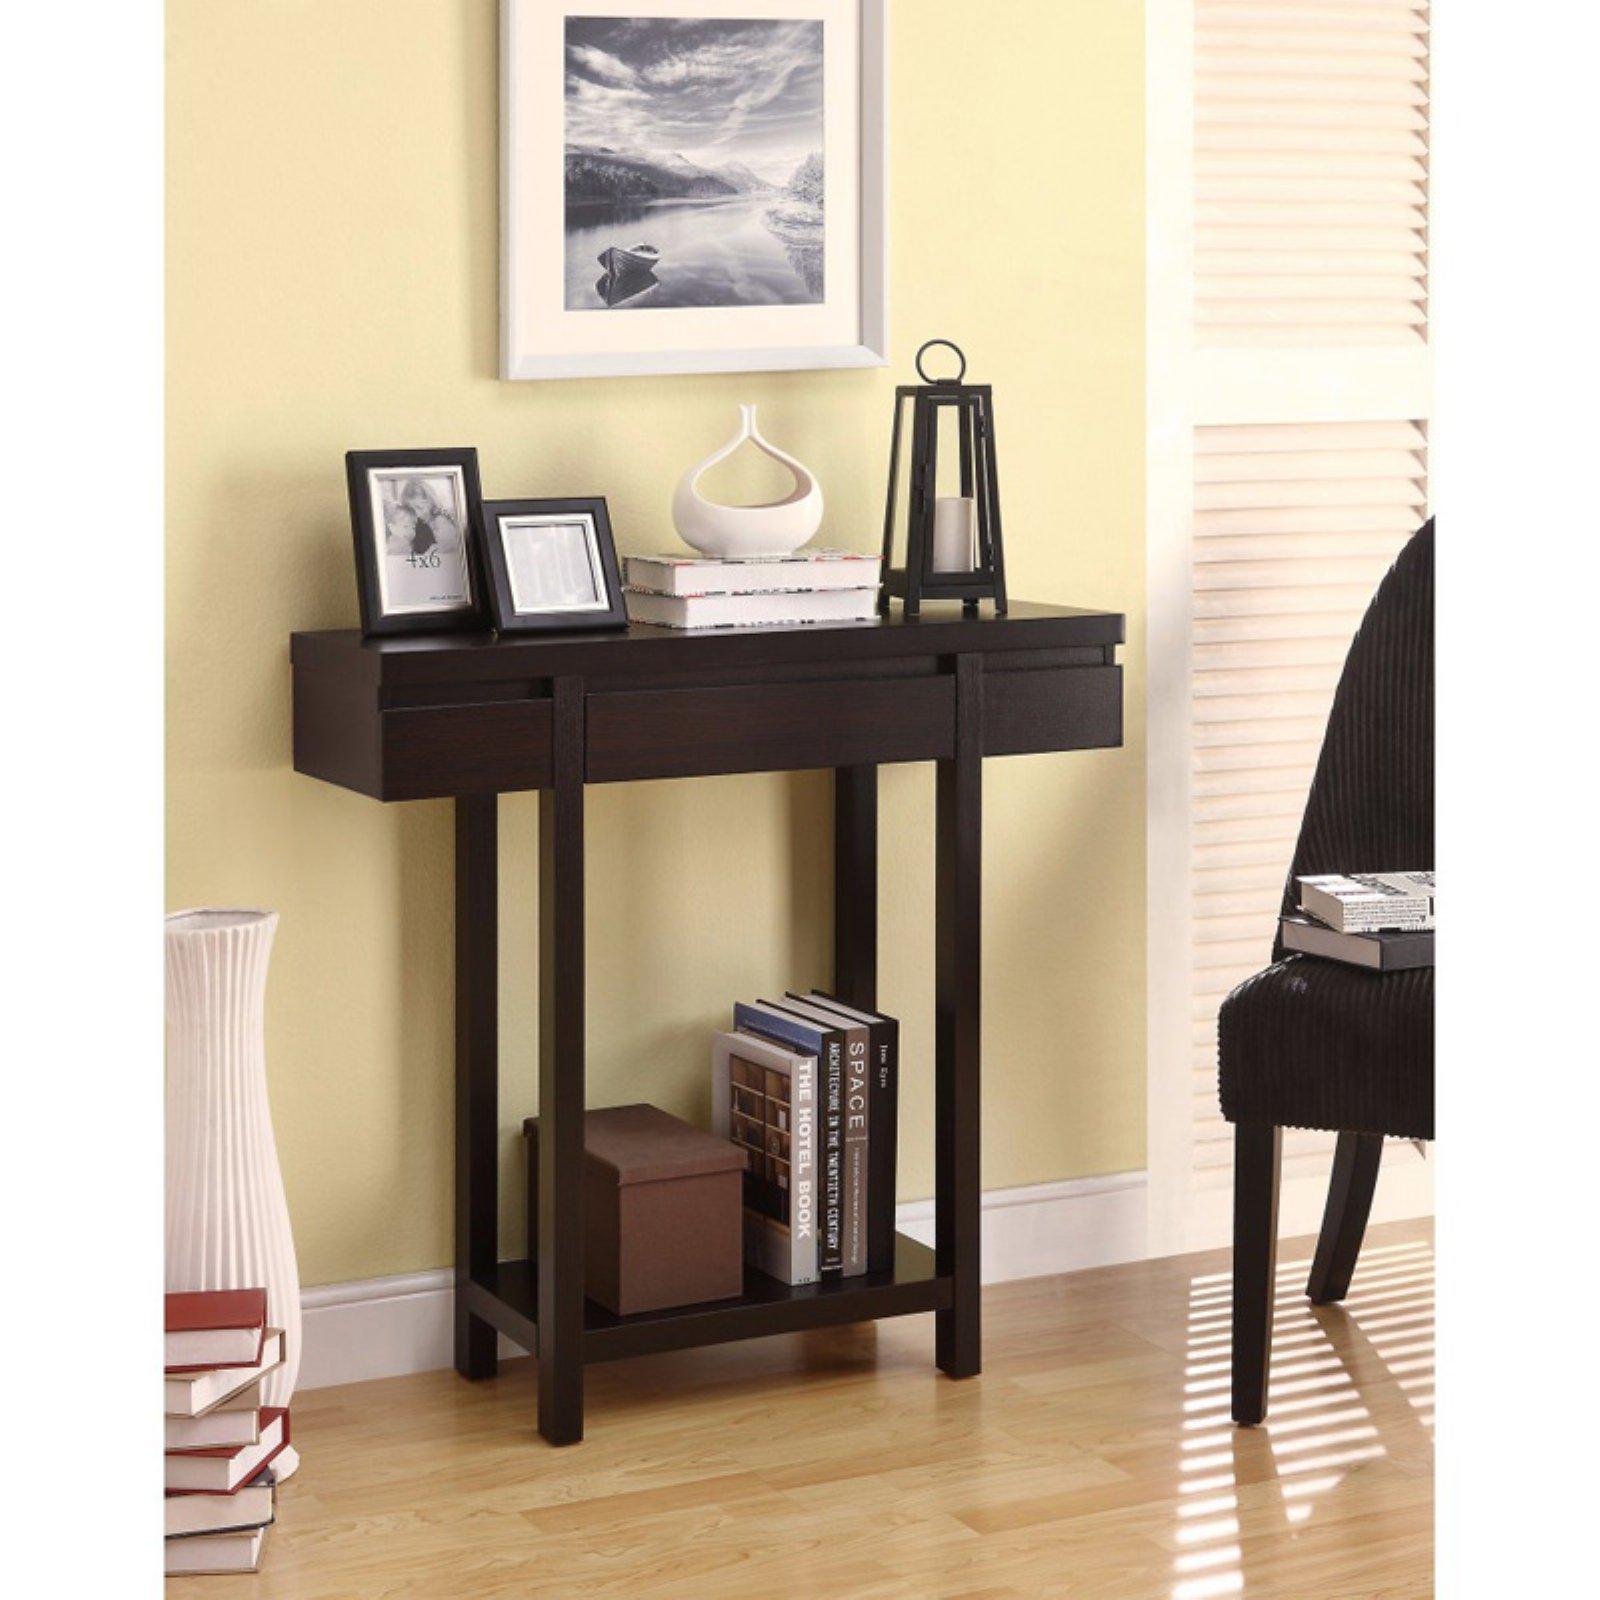 Benzara Contemporary Console Table With Lower Shelf Contemporary